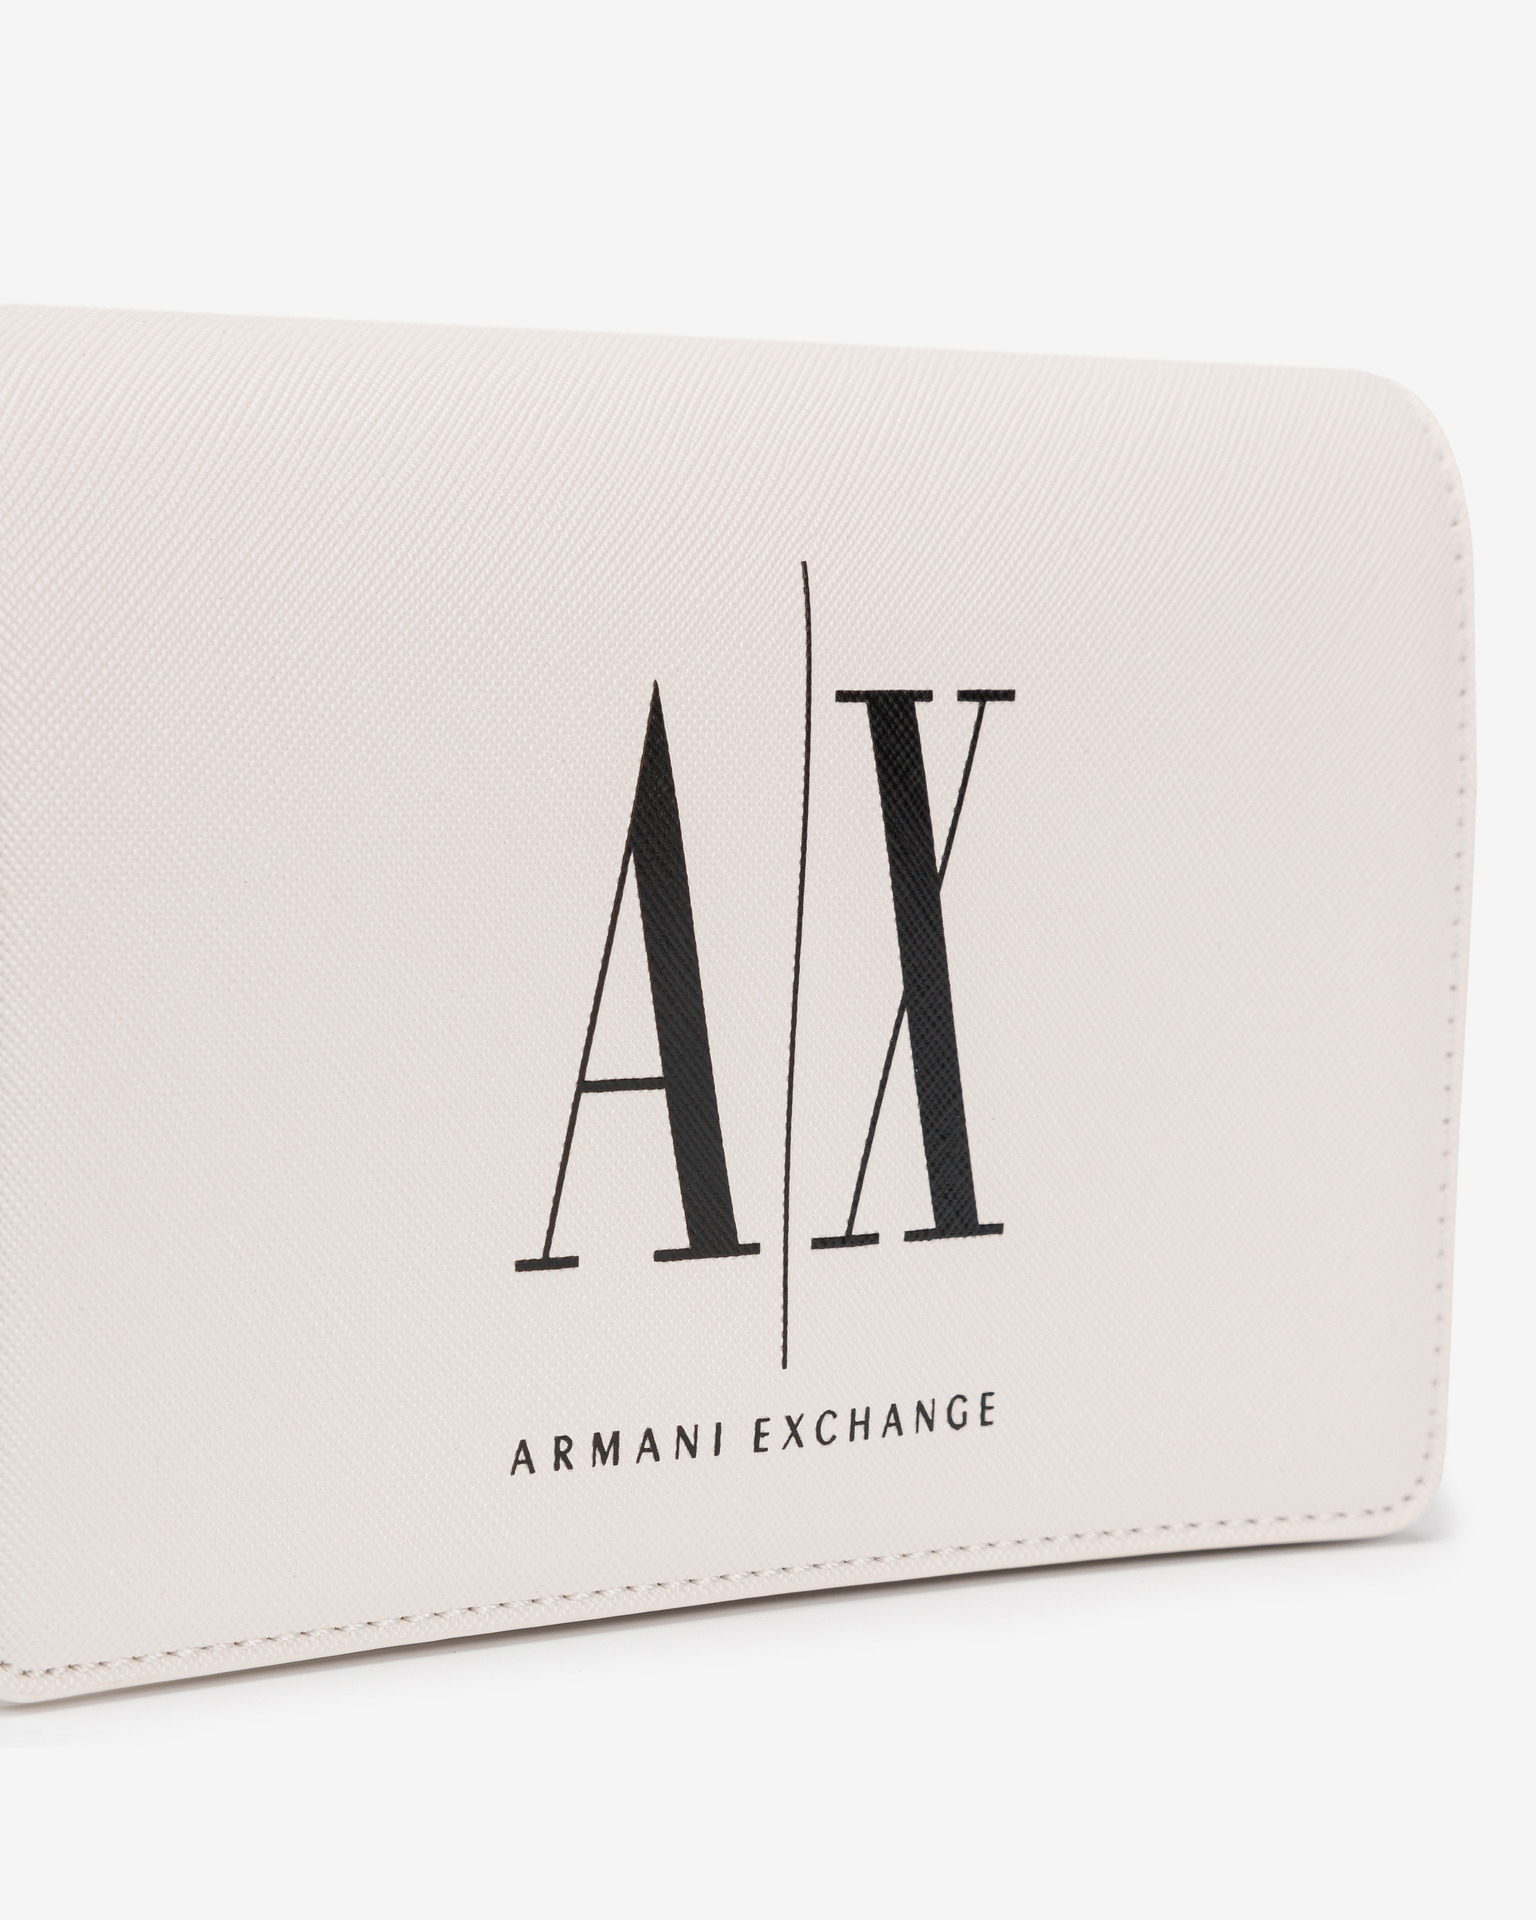 Armani Exchange bianco borsetta